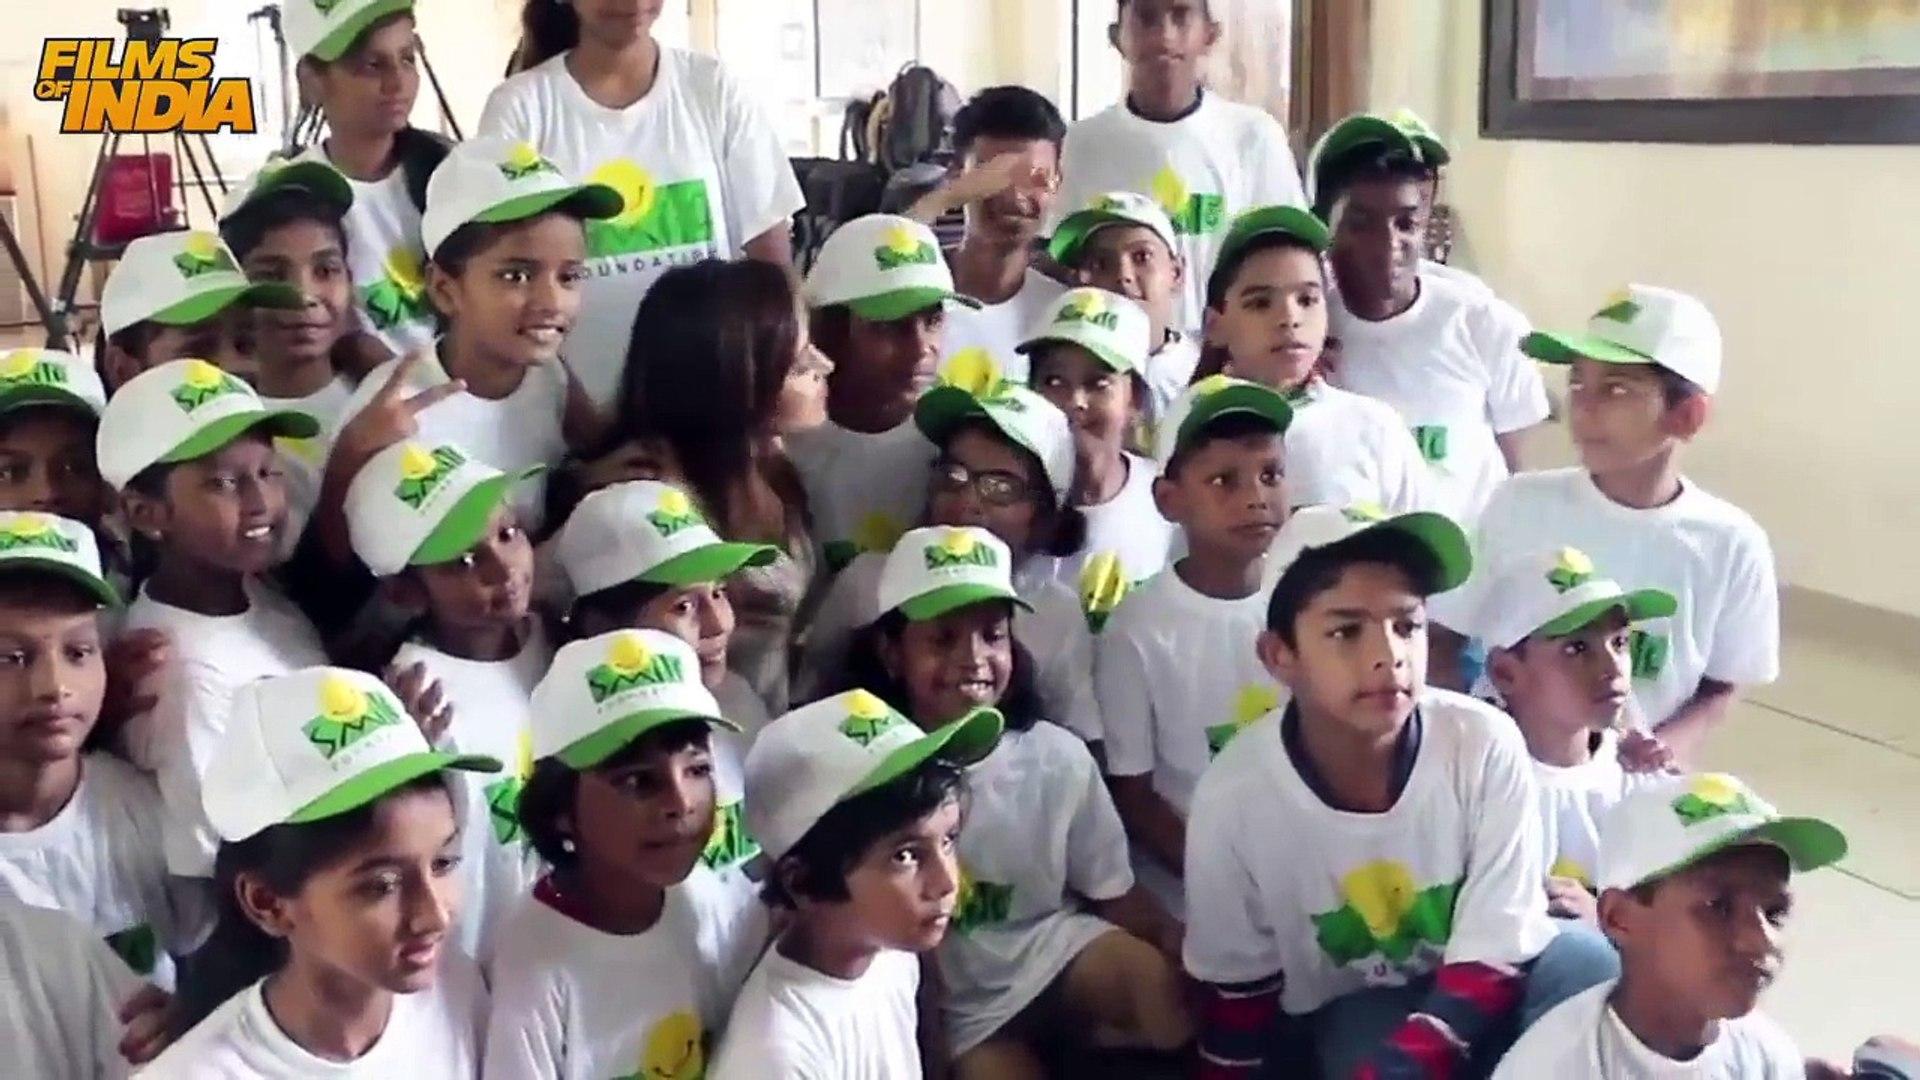 UNCUT - Nushrat Bharucha Celebrating Her Birthday with kids of Smile foundation